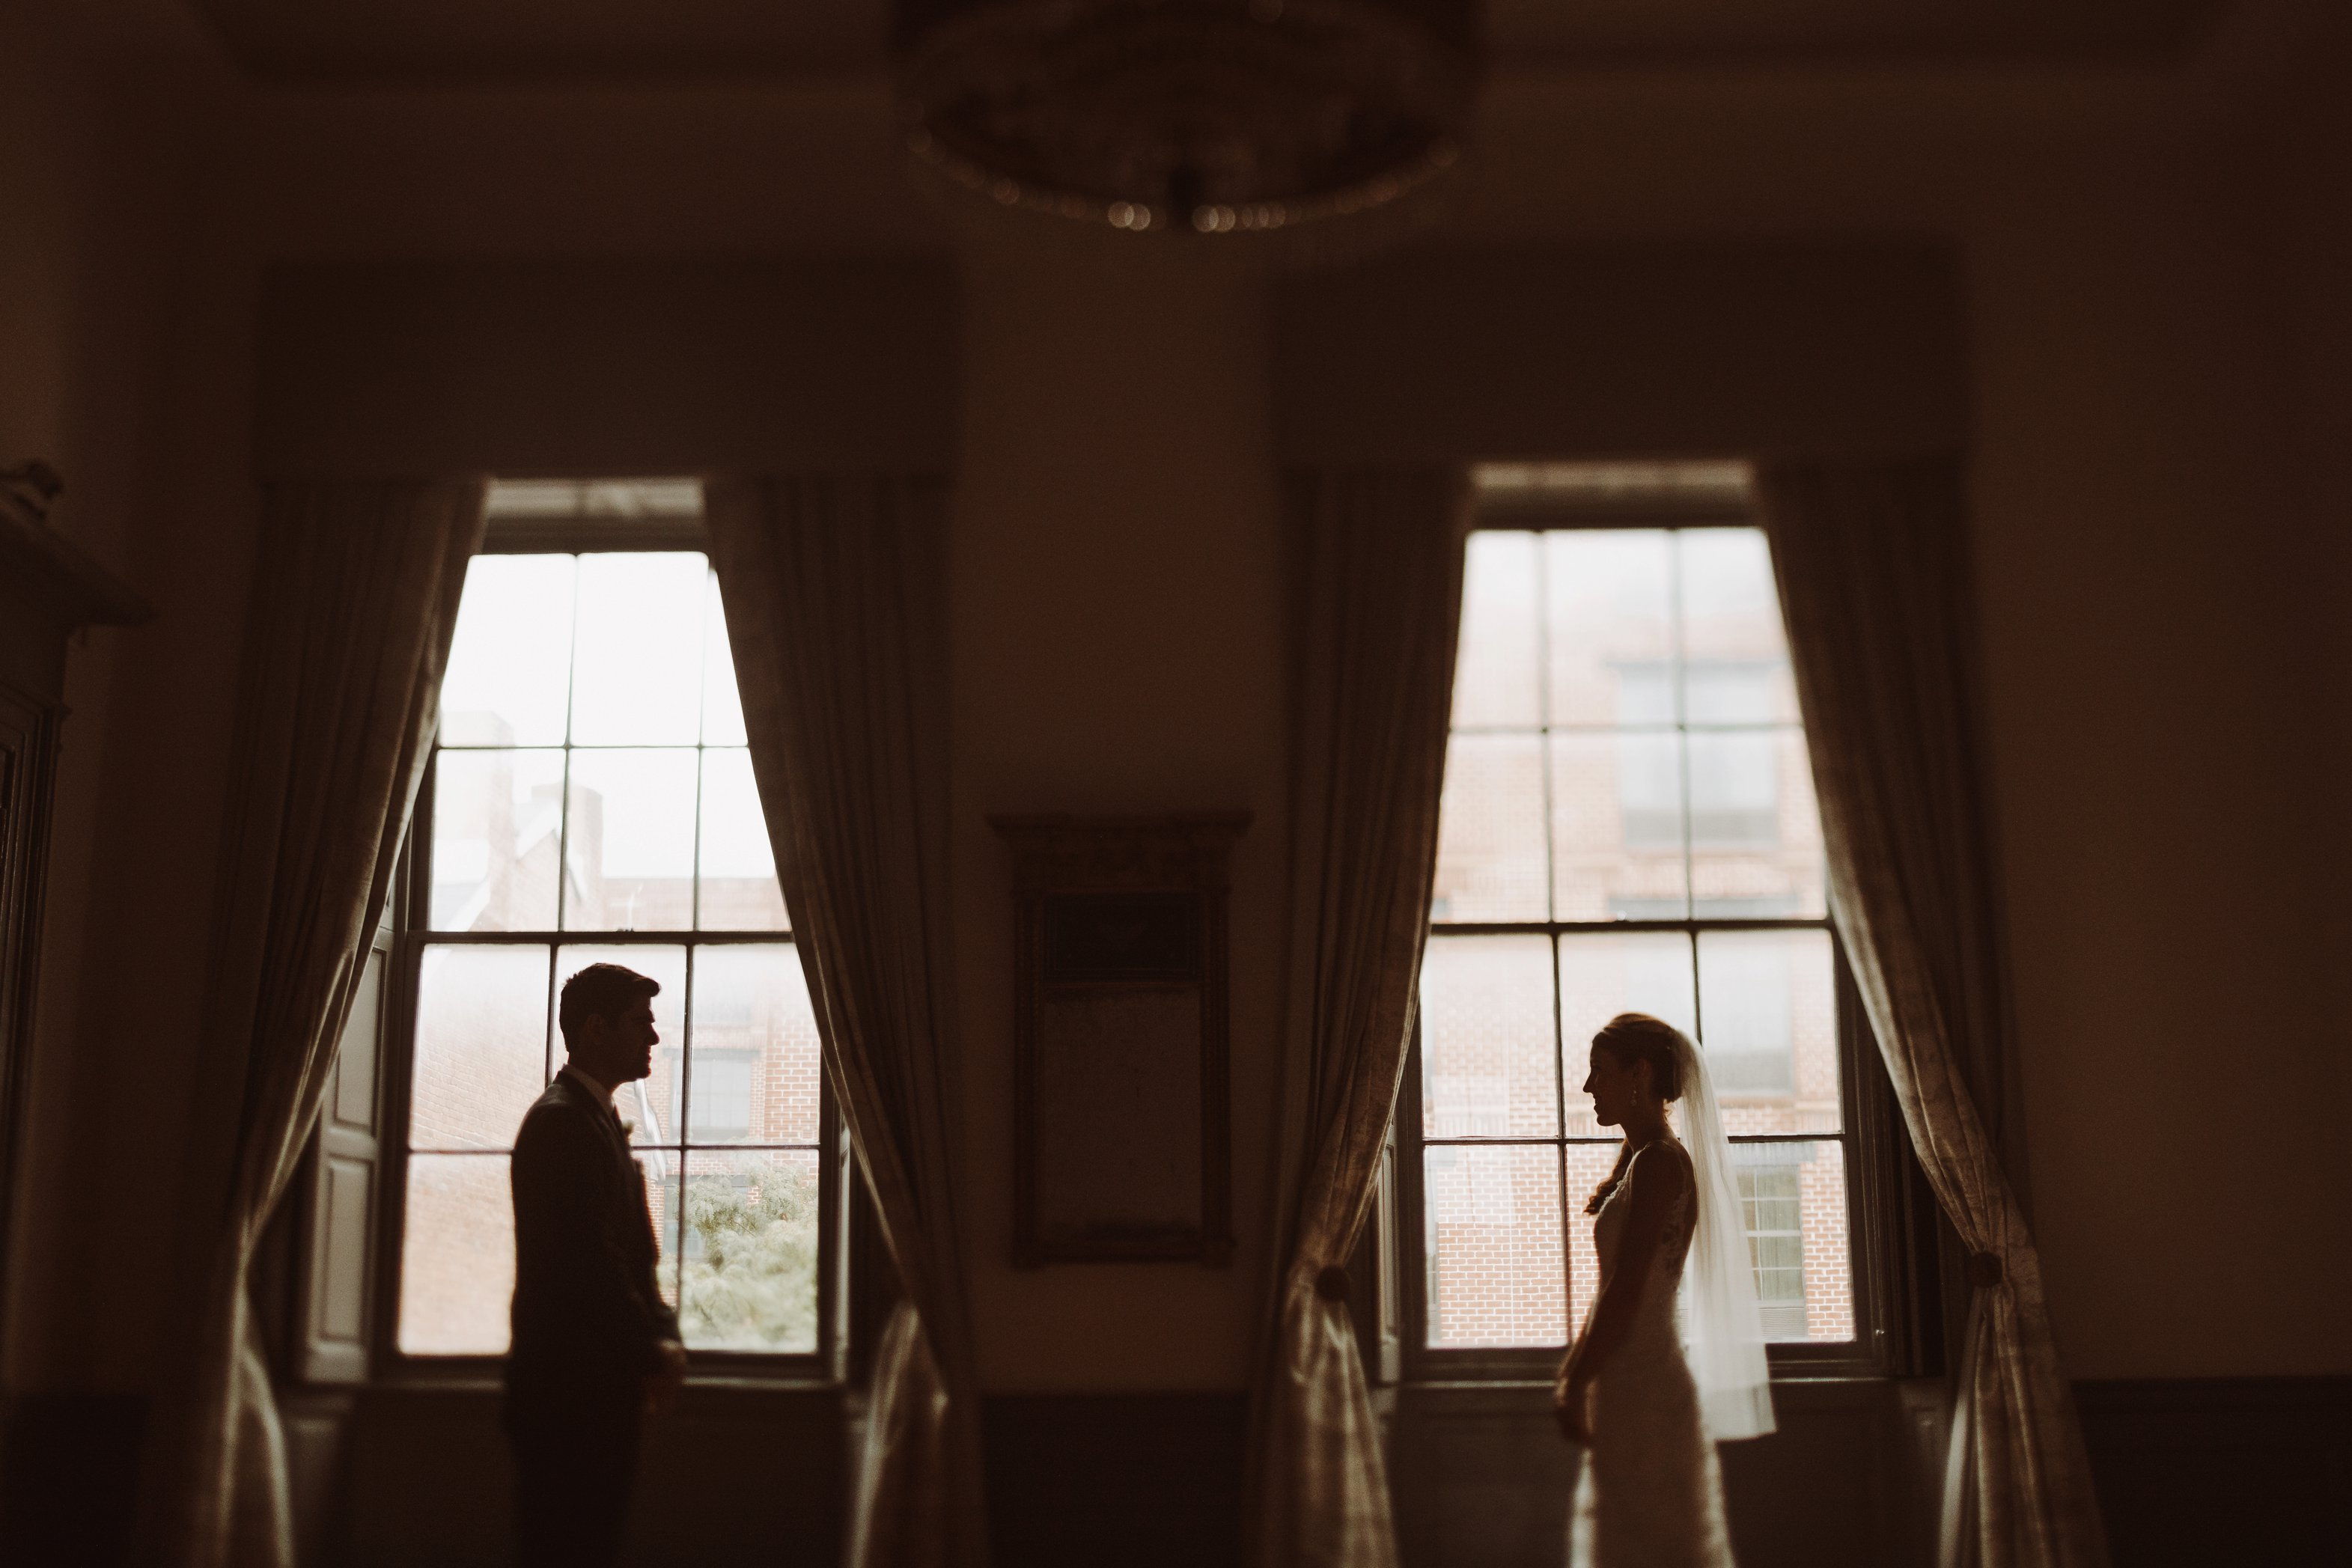 bride and groom first look 1840s Ballroom Baltimore Maryland wedding photographer